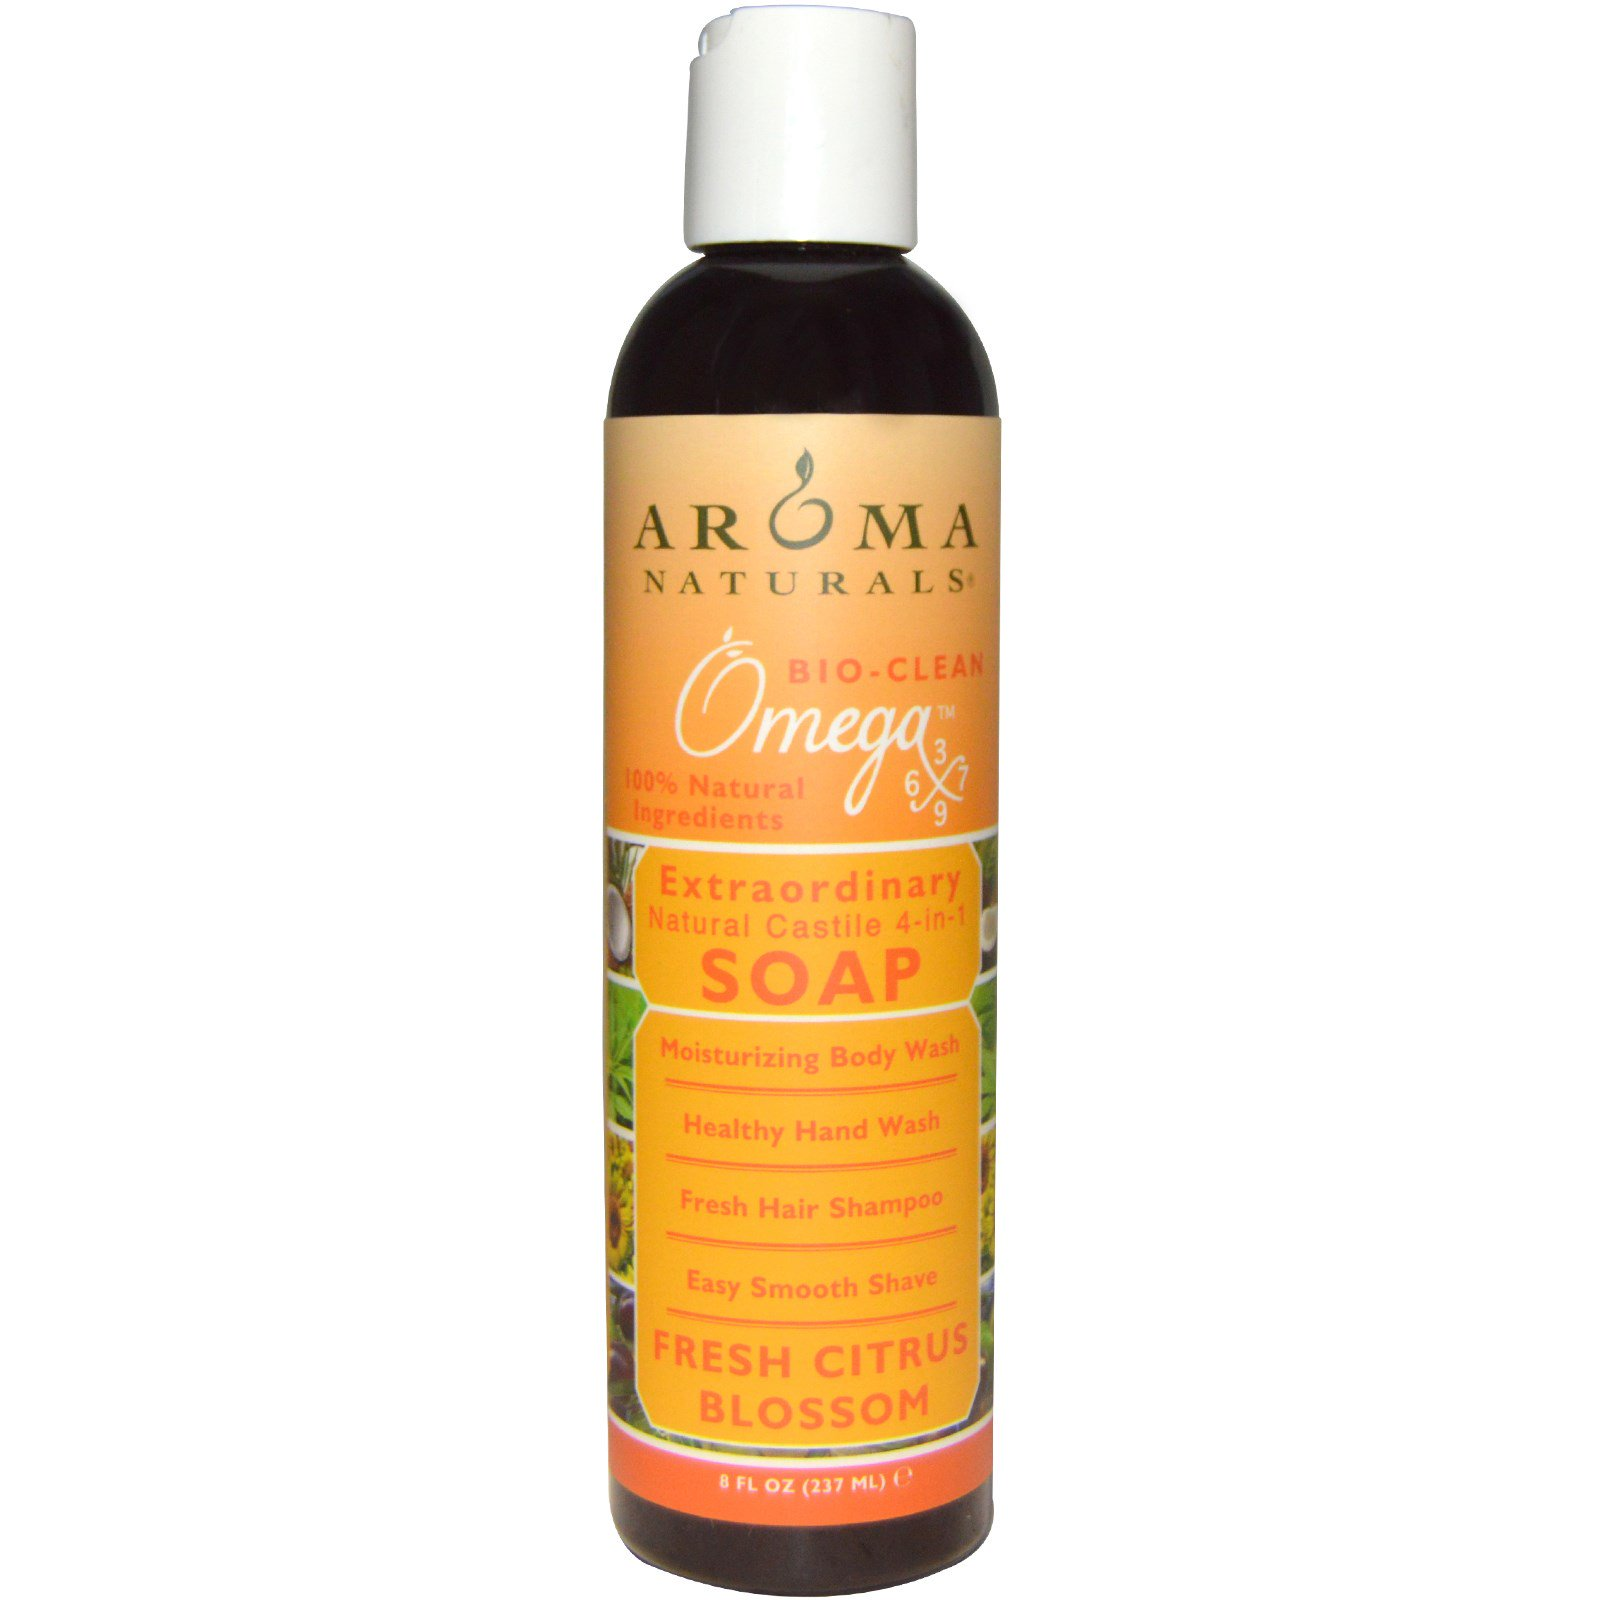 Aroma Naturals, 4-in-1 Soap, Fresh Citrus Blossom, 8 fl oz (237 ml)